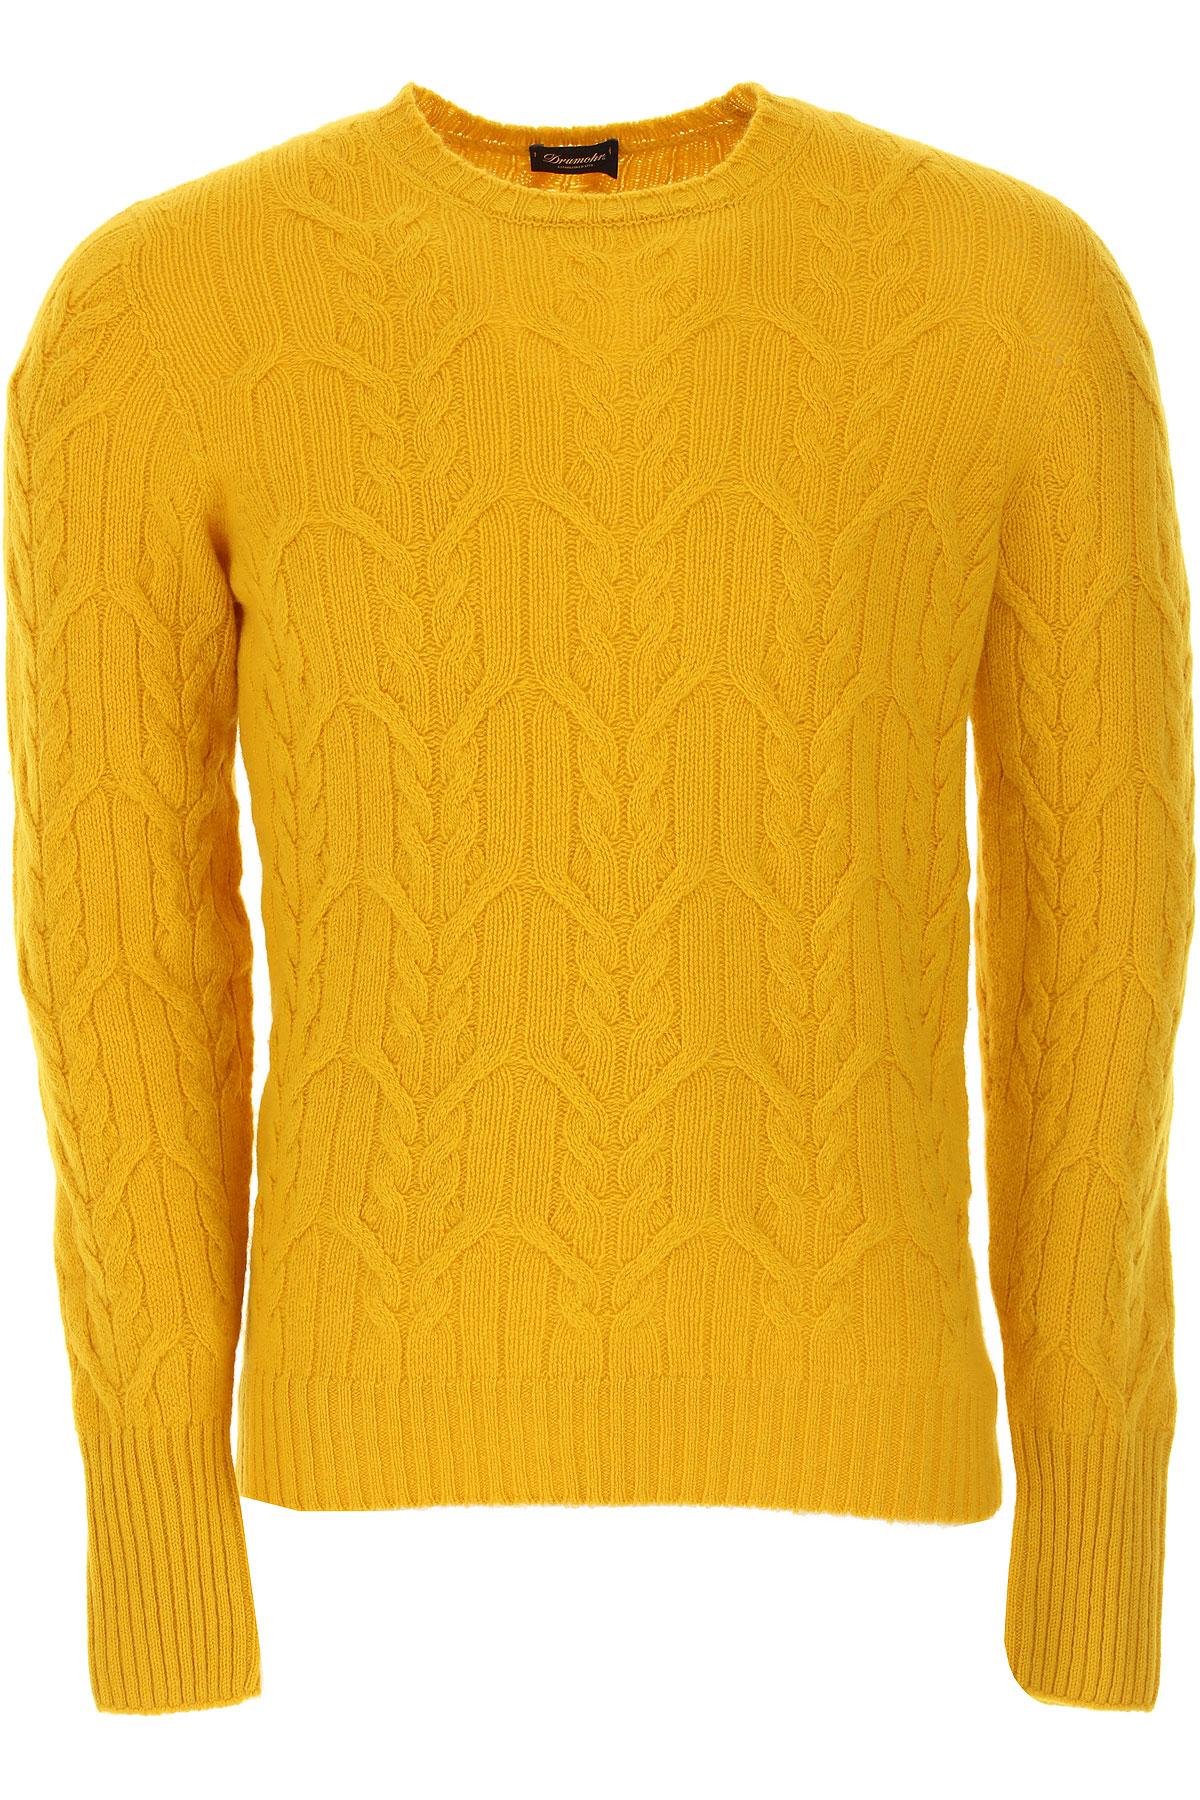 Drumohr Sweater for Men Jumper On Sale, Yellow, Lambswool, 2019, L M XL